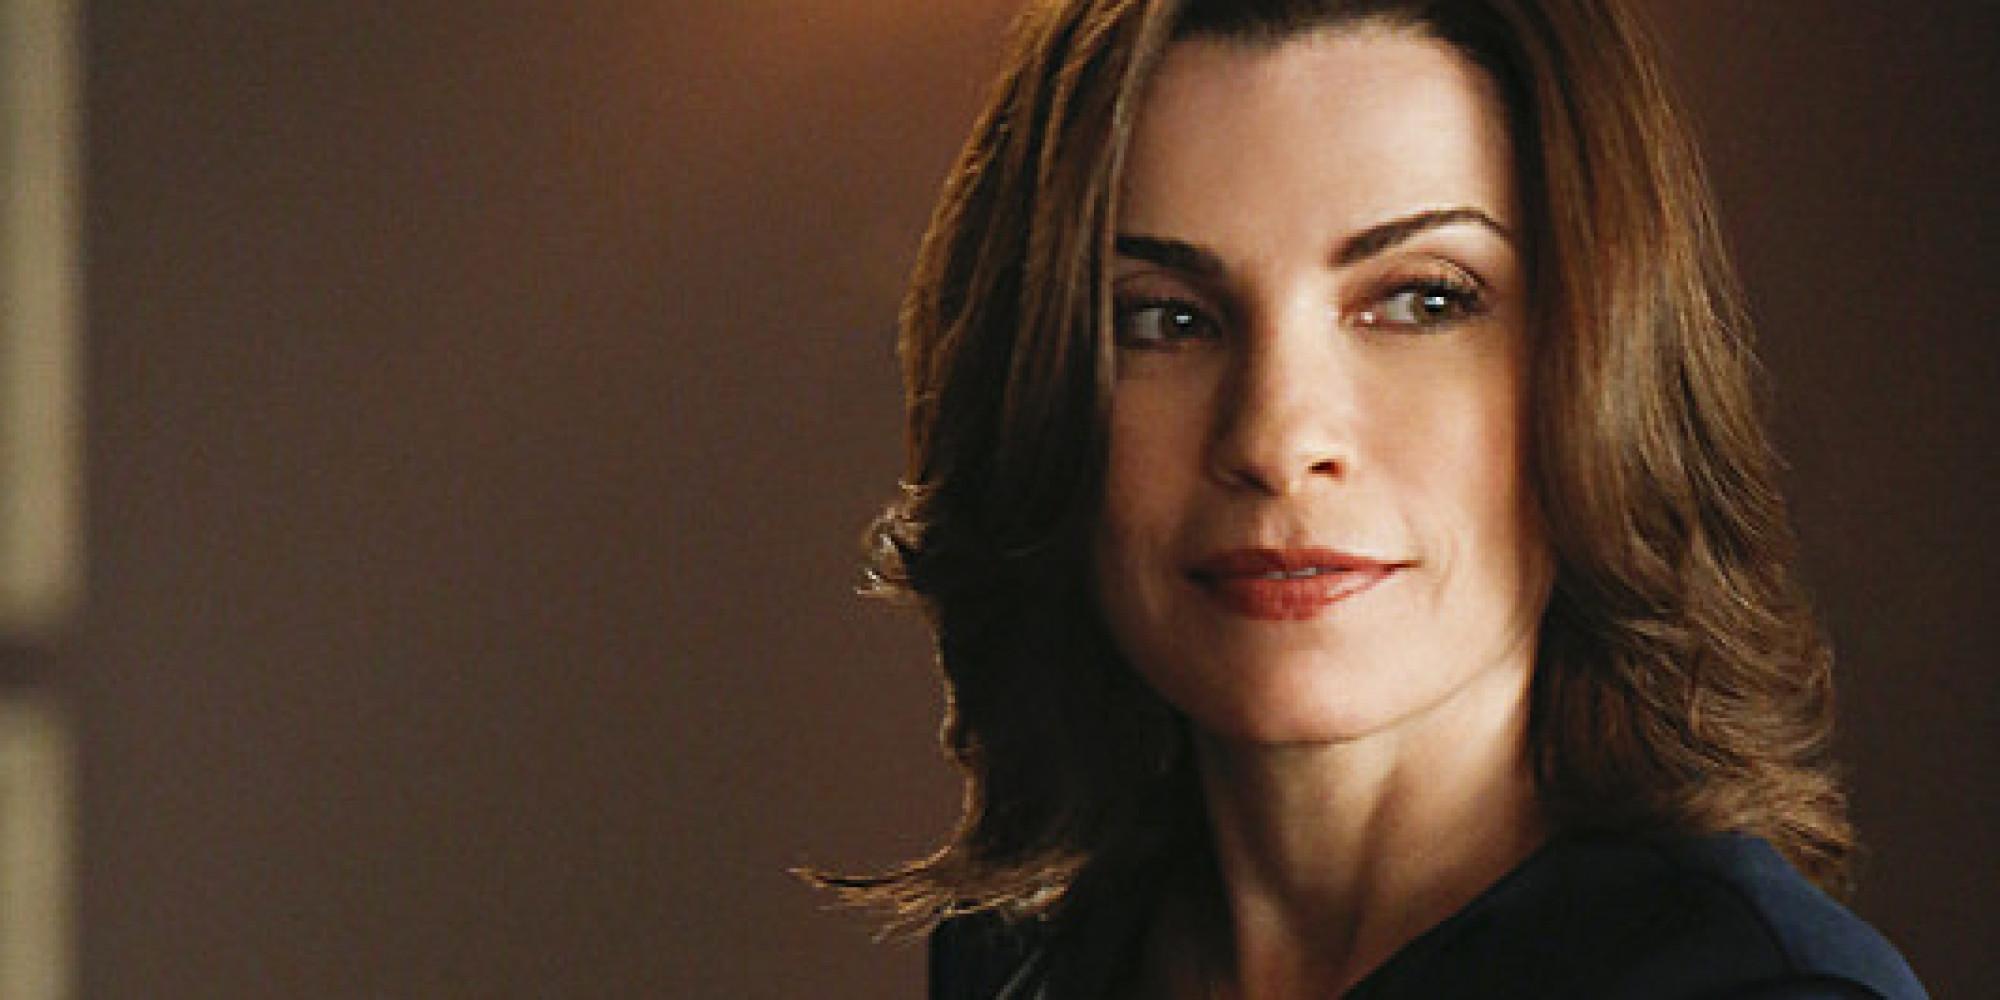 julianna margulies: 'the good wife' season 5 is 'intense